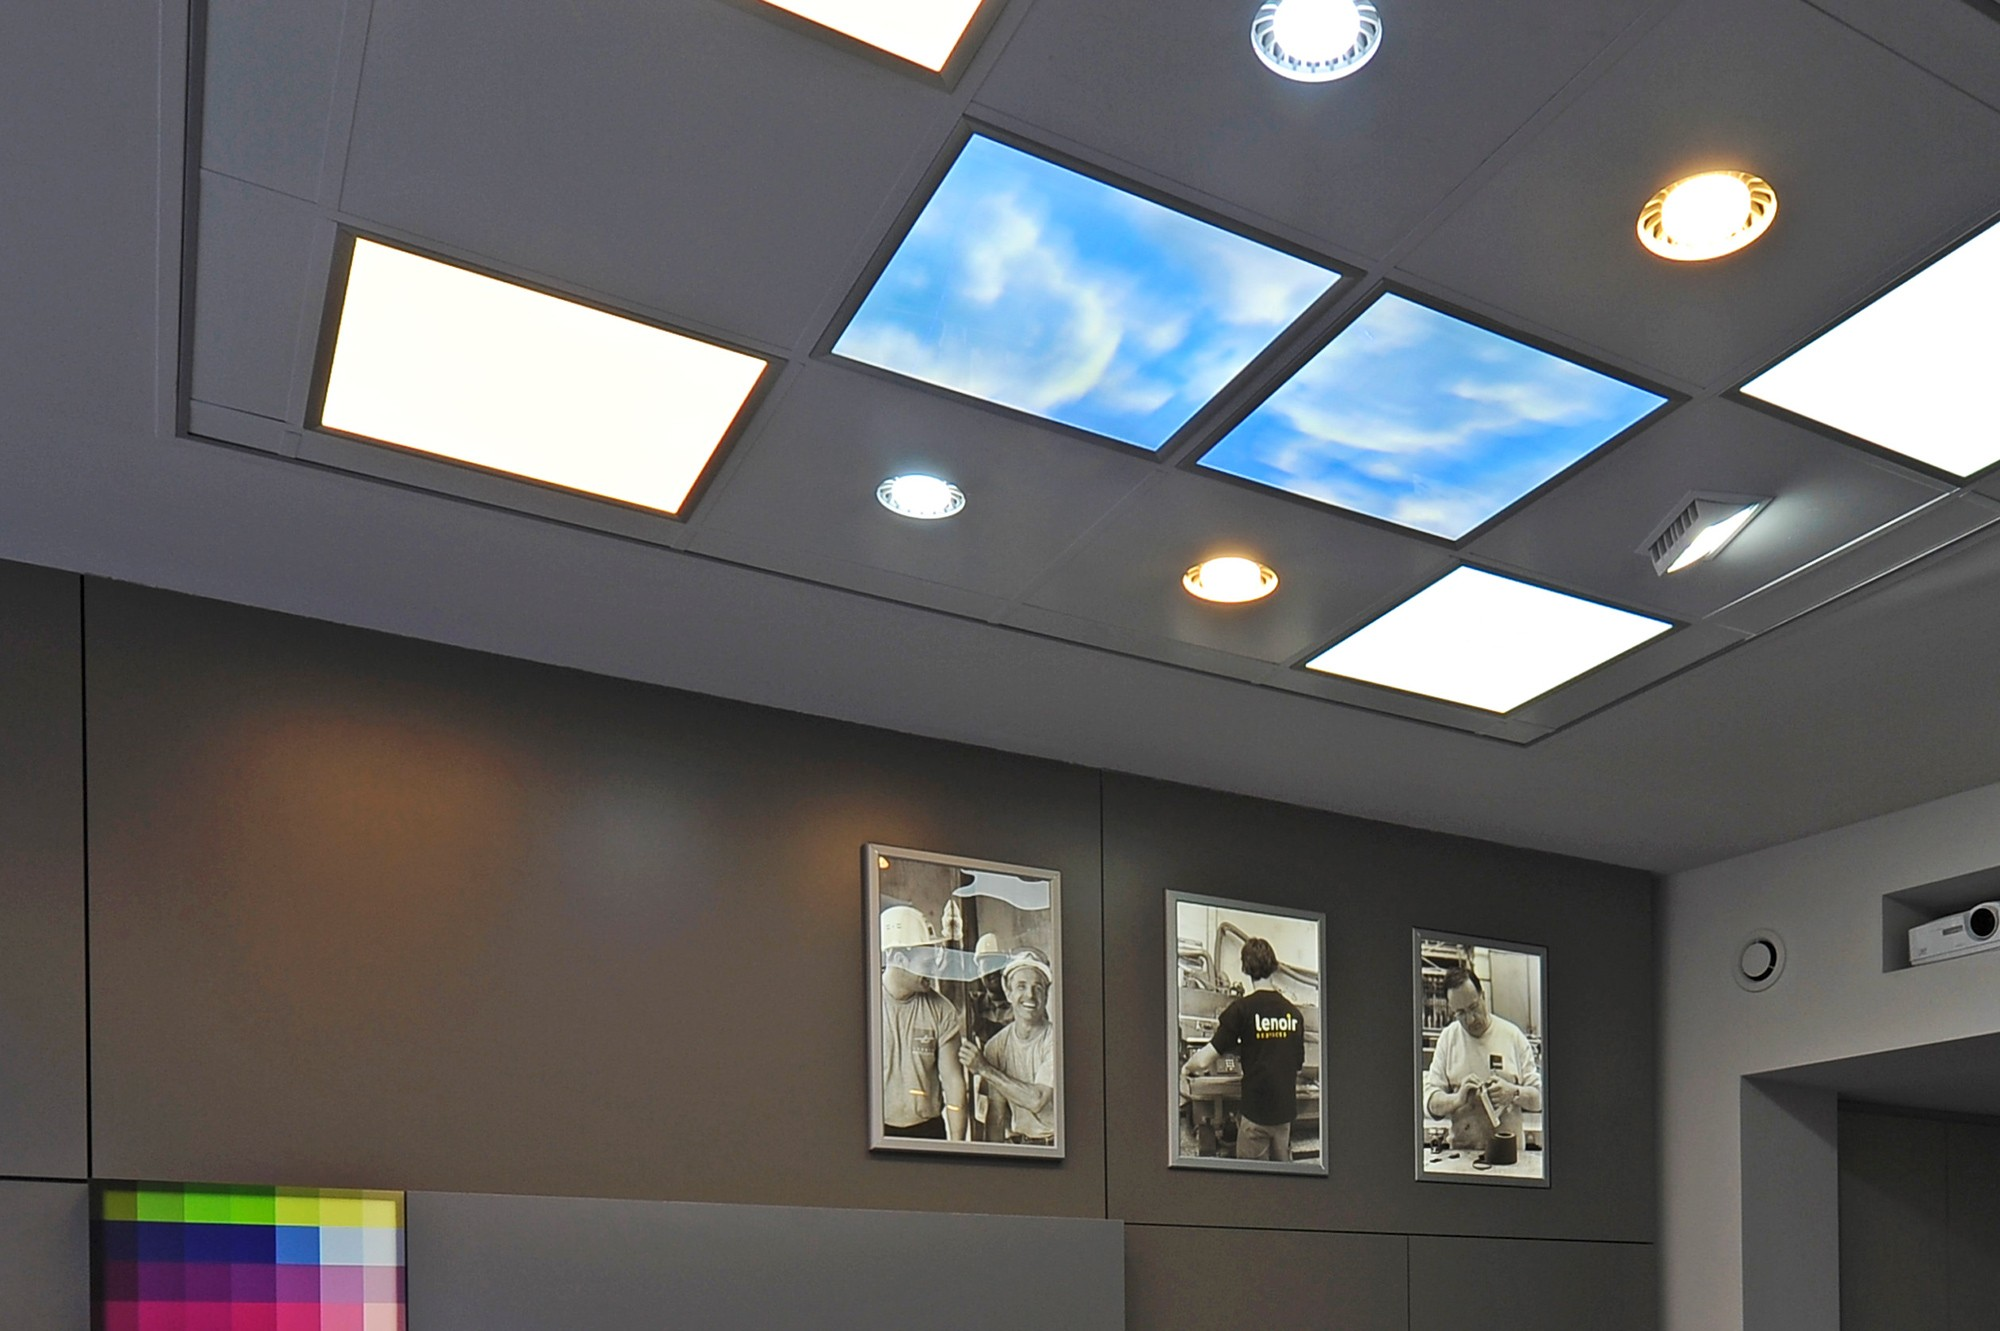 plafonniers led lenoir services. Black Bedroom Furniture Sets. Home Design Ideas